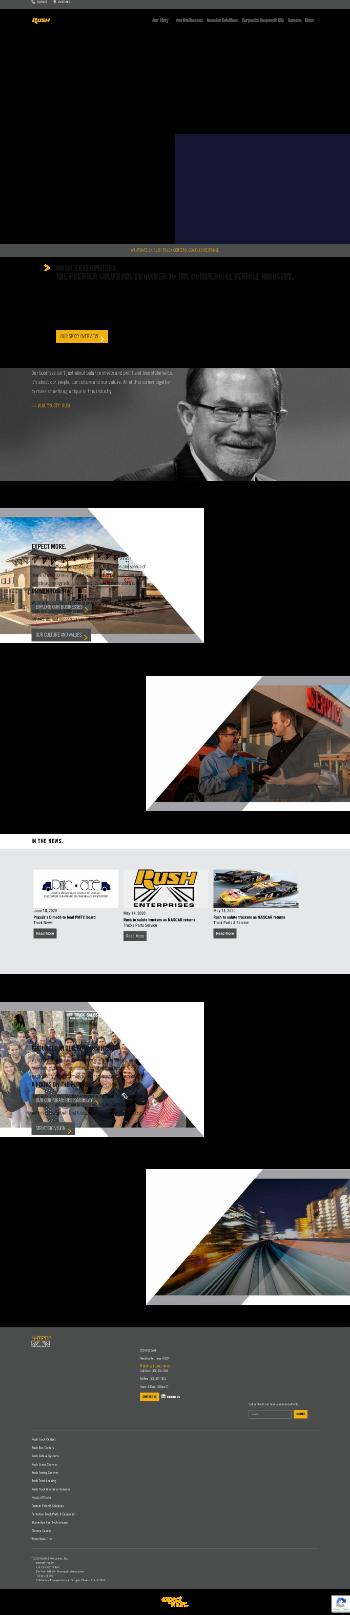 Rush Enterprises, Inc. Website Screenshot